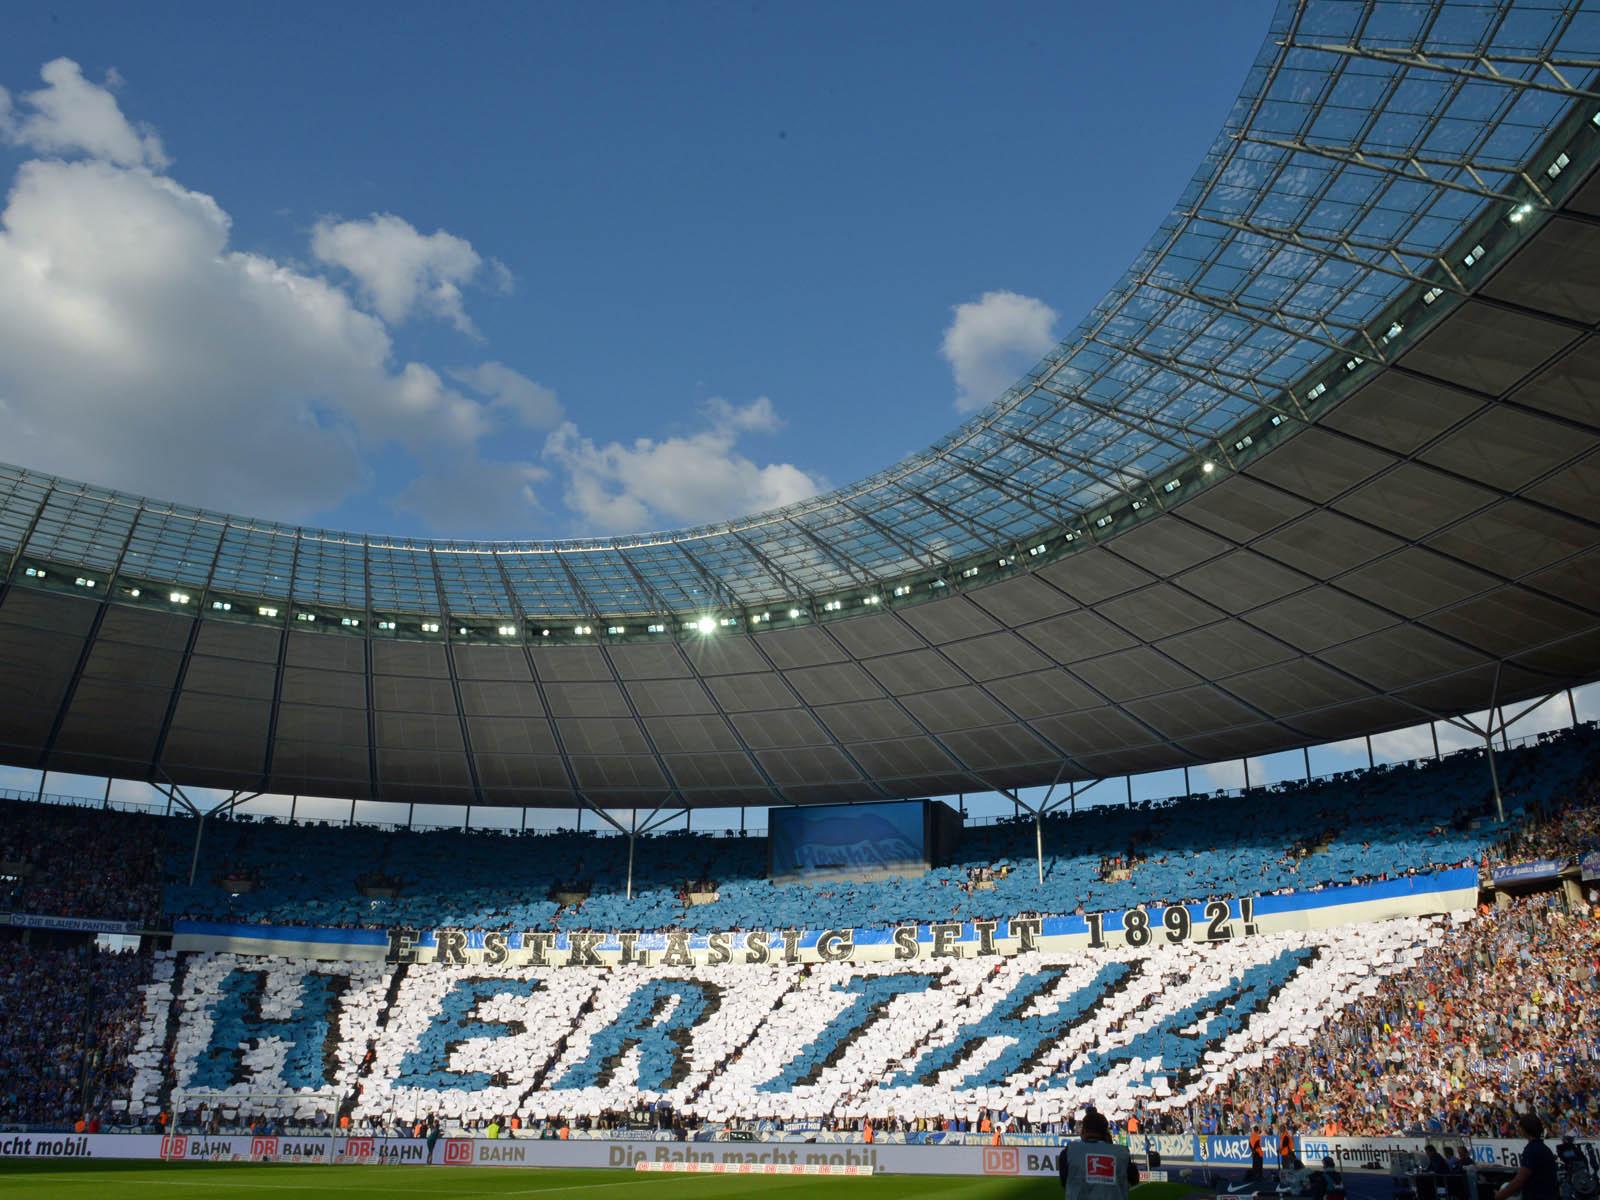 Hertha bleibt im Olympiastadion - Neubau bleibt Thema